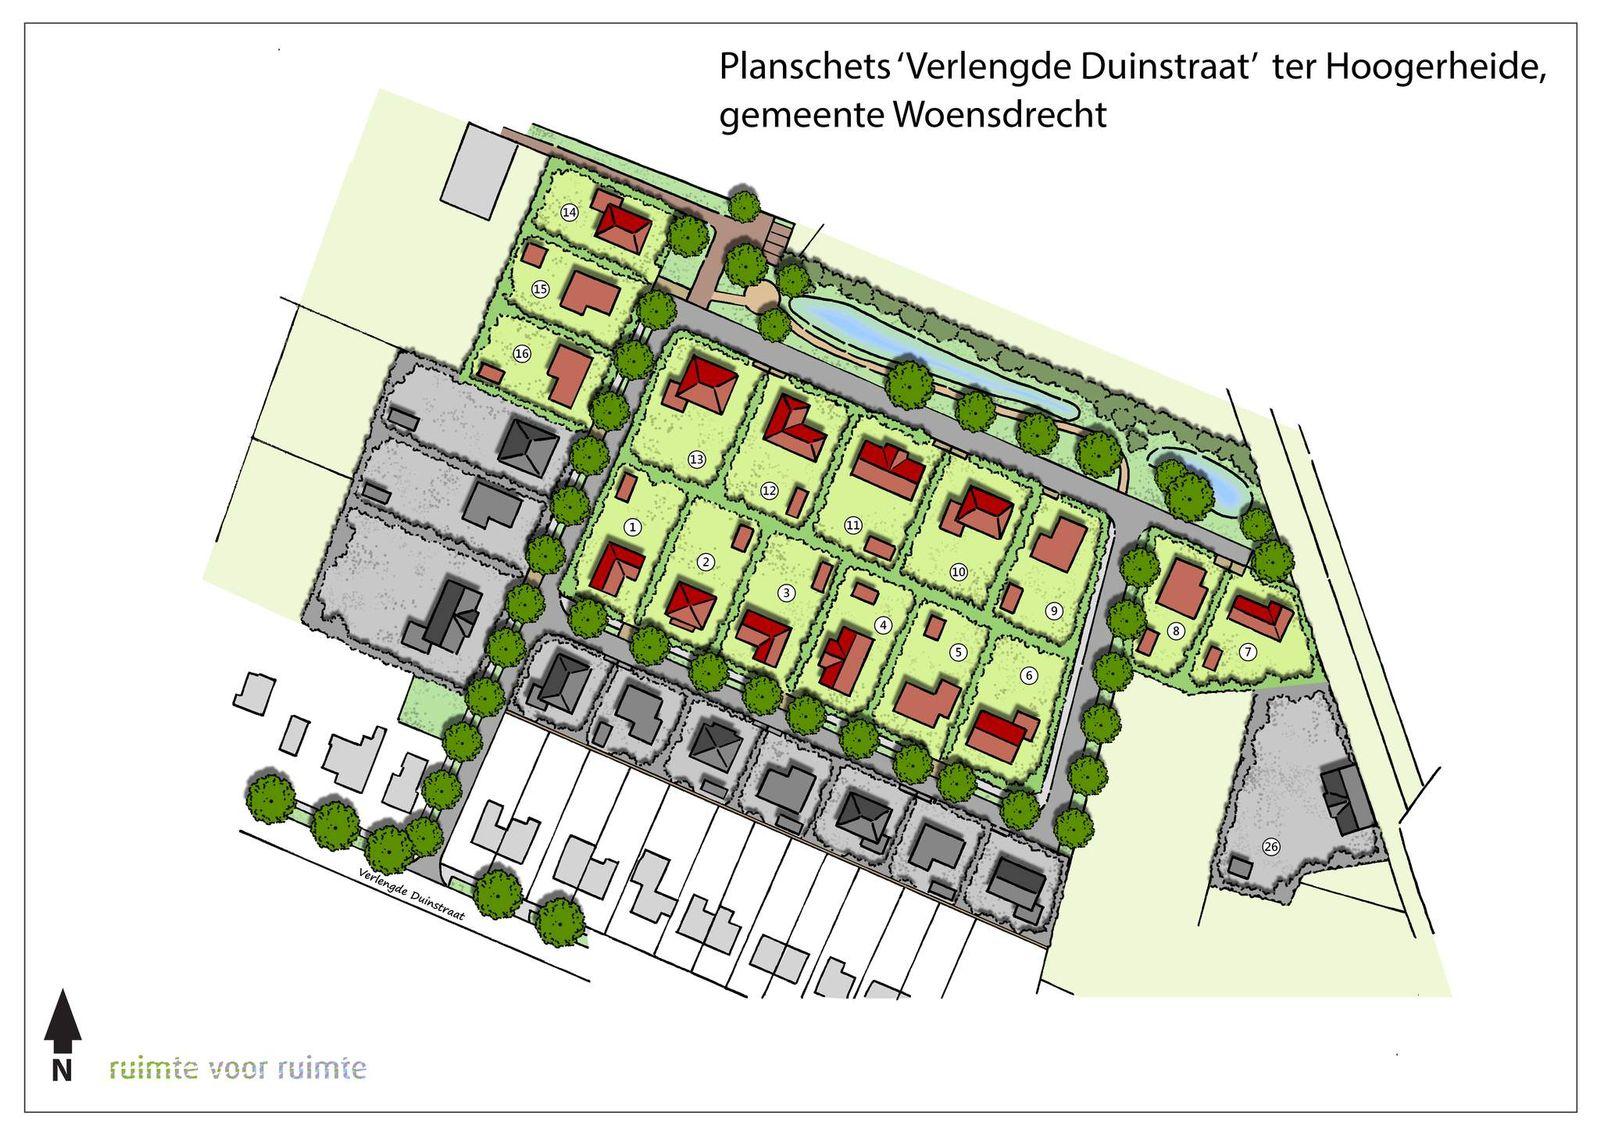 Verlengde Duinstraat 0-ong, Hoogerheide